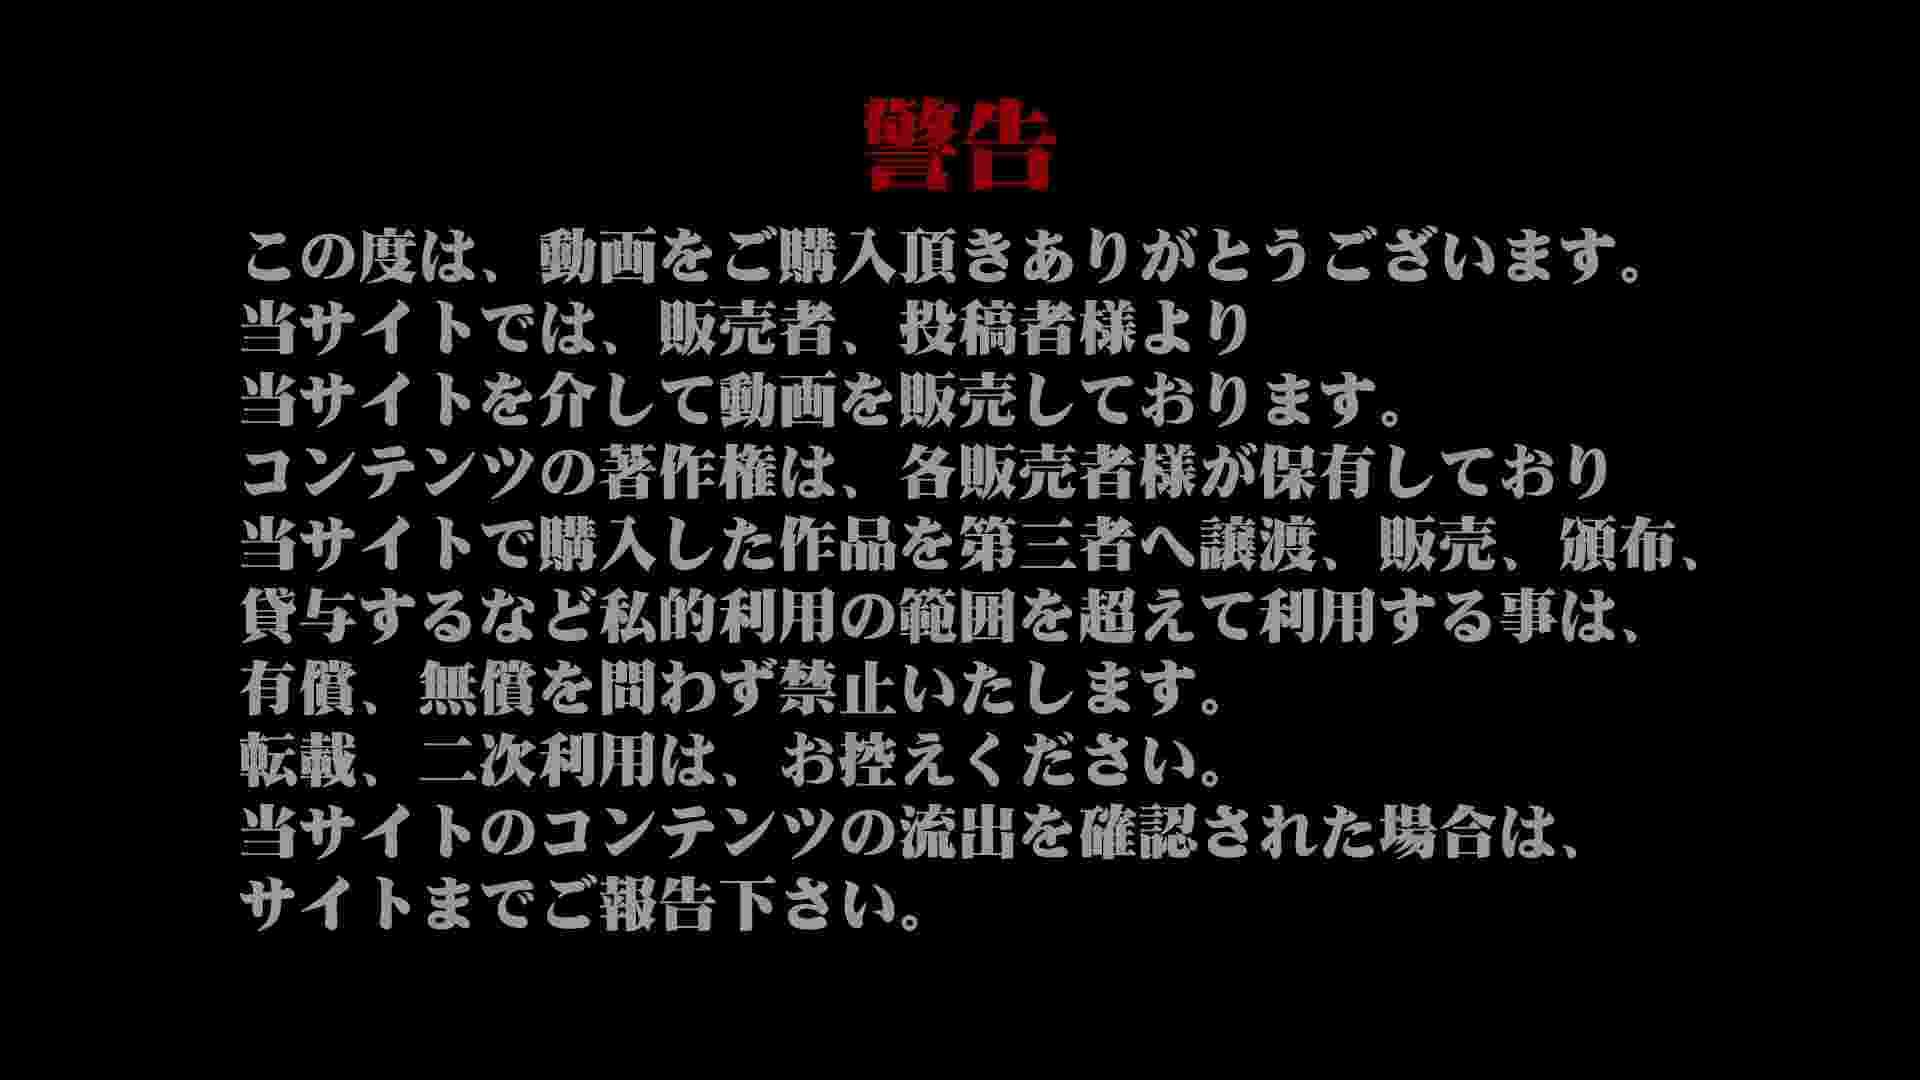 Aquaな露天風呂Vol.953 盗撮師作品   露天風呂突入  70pic 1